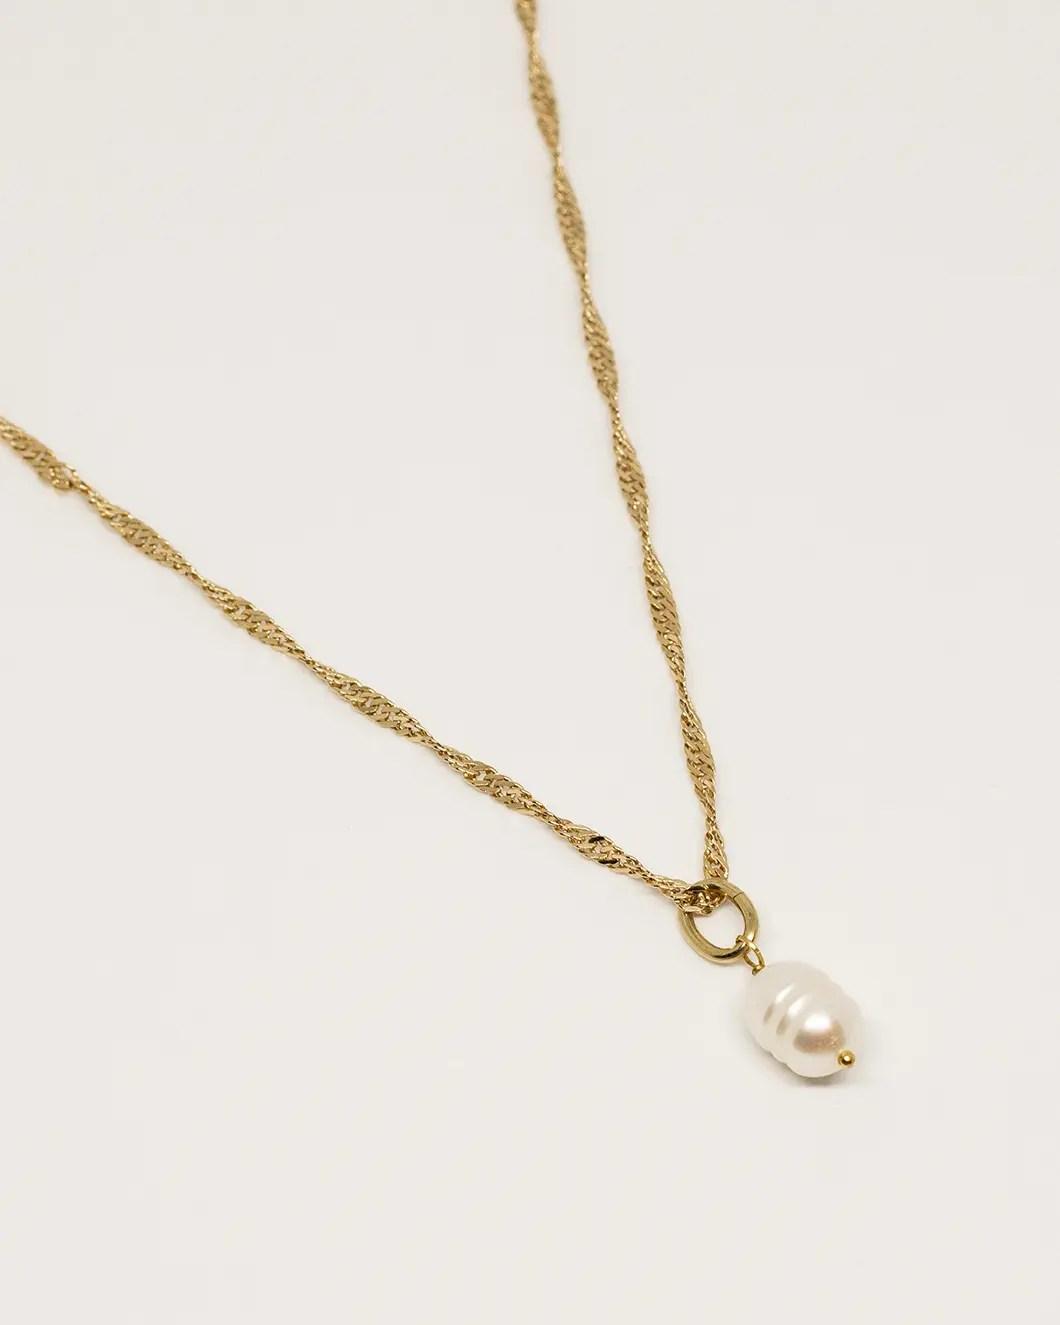 Collier pendentif perle de culture